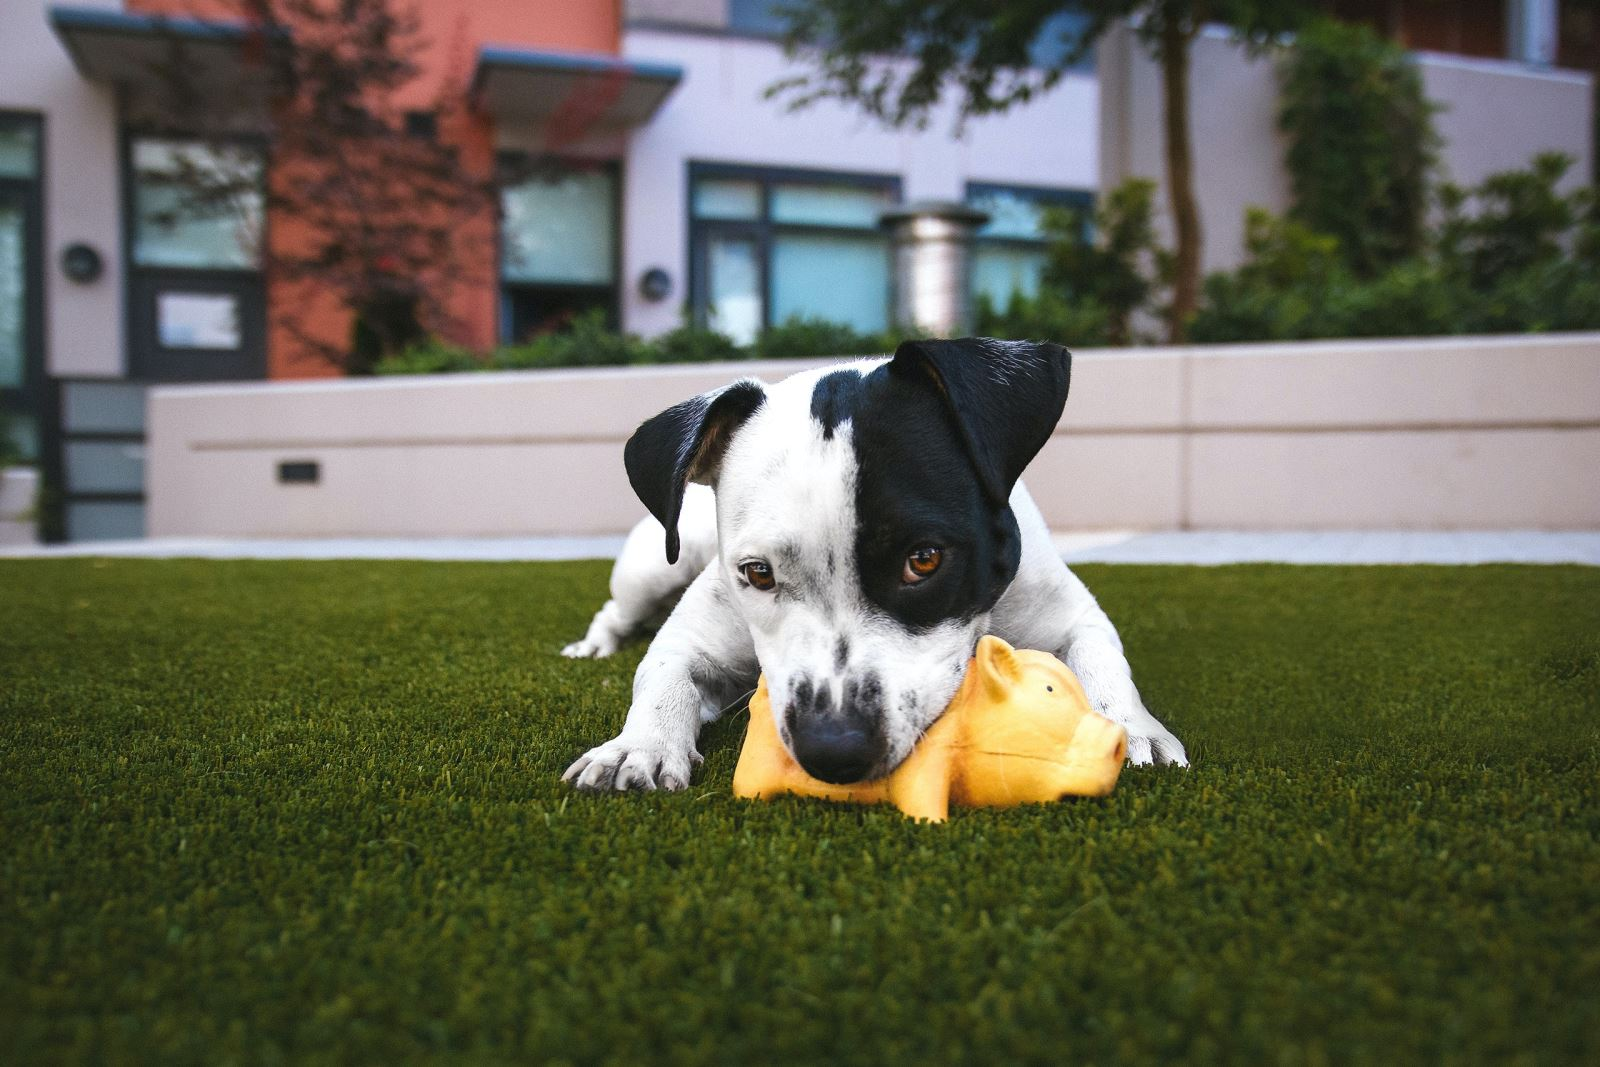 dog biting toy